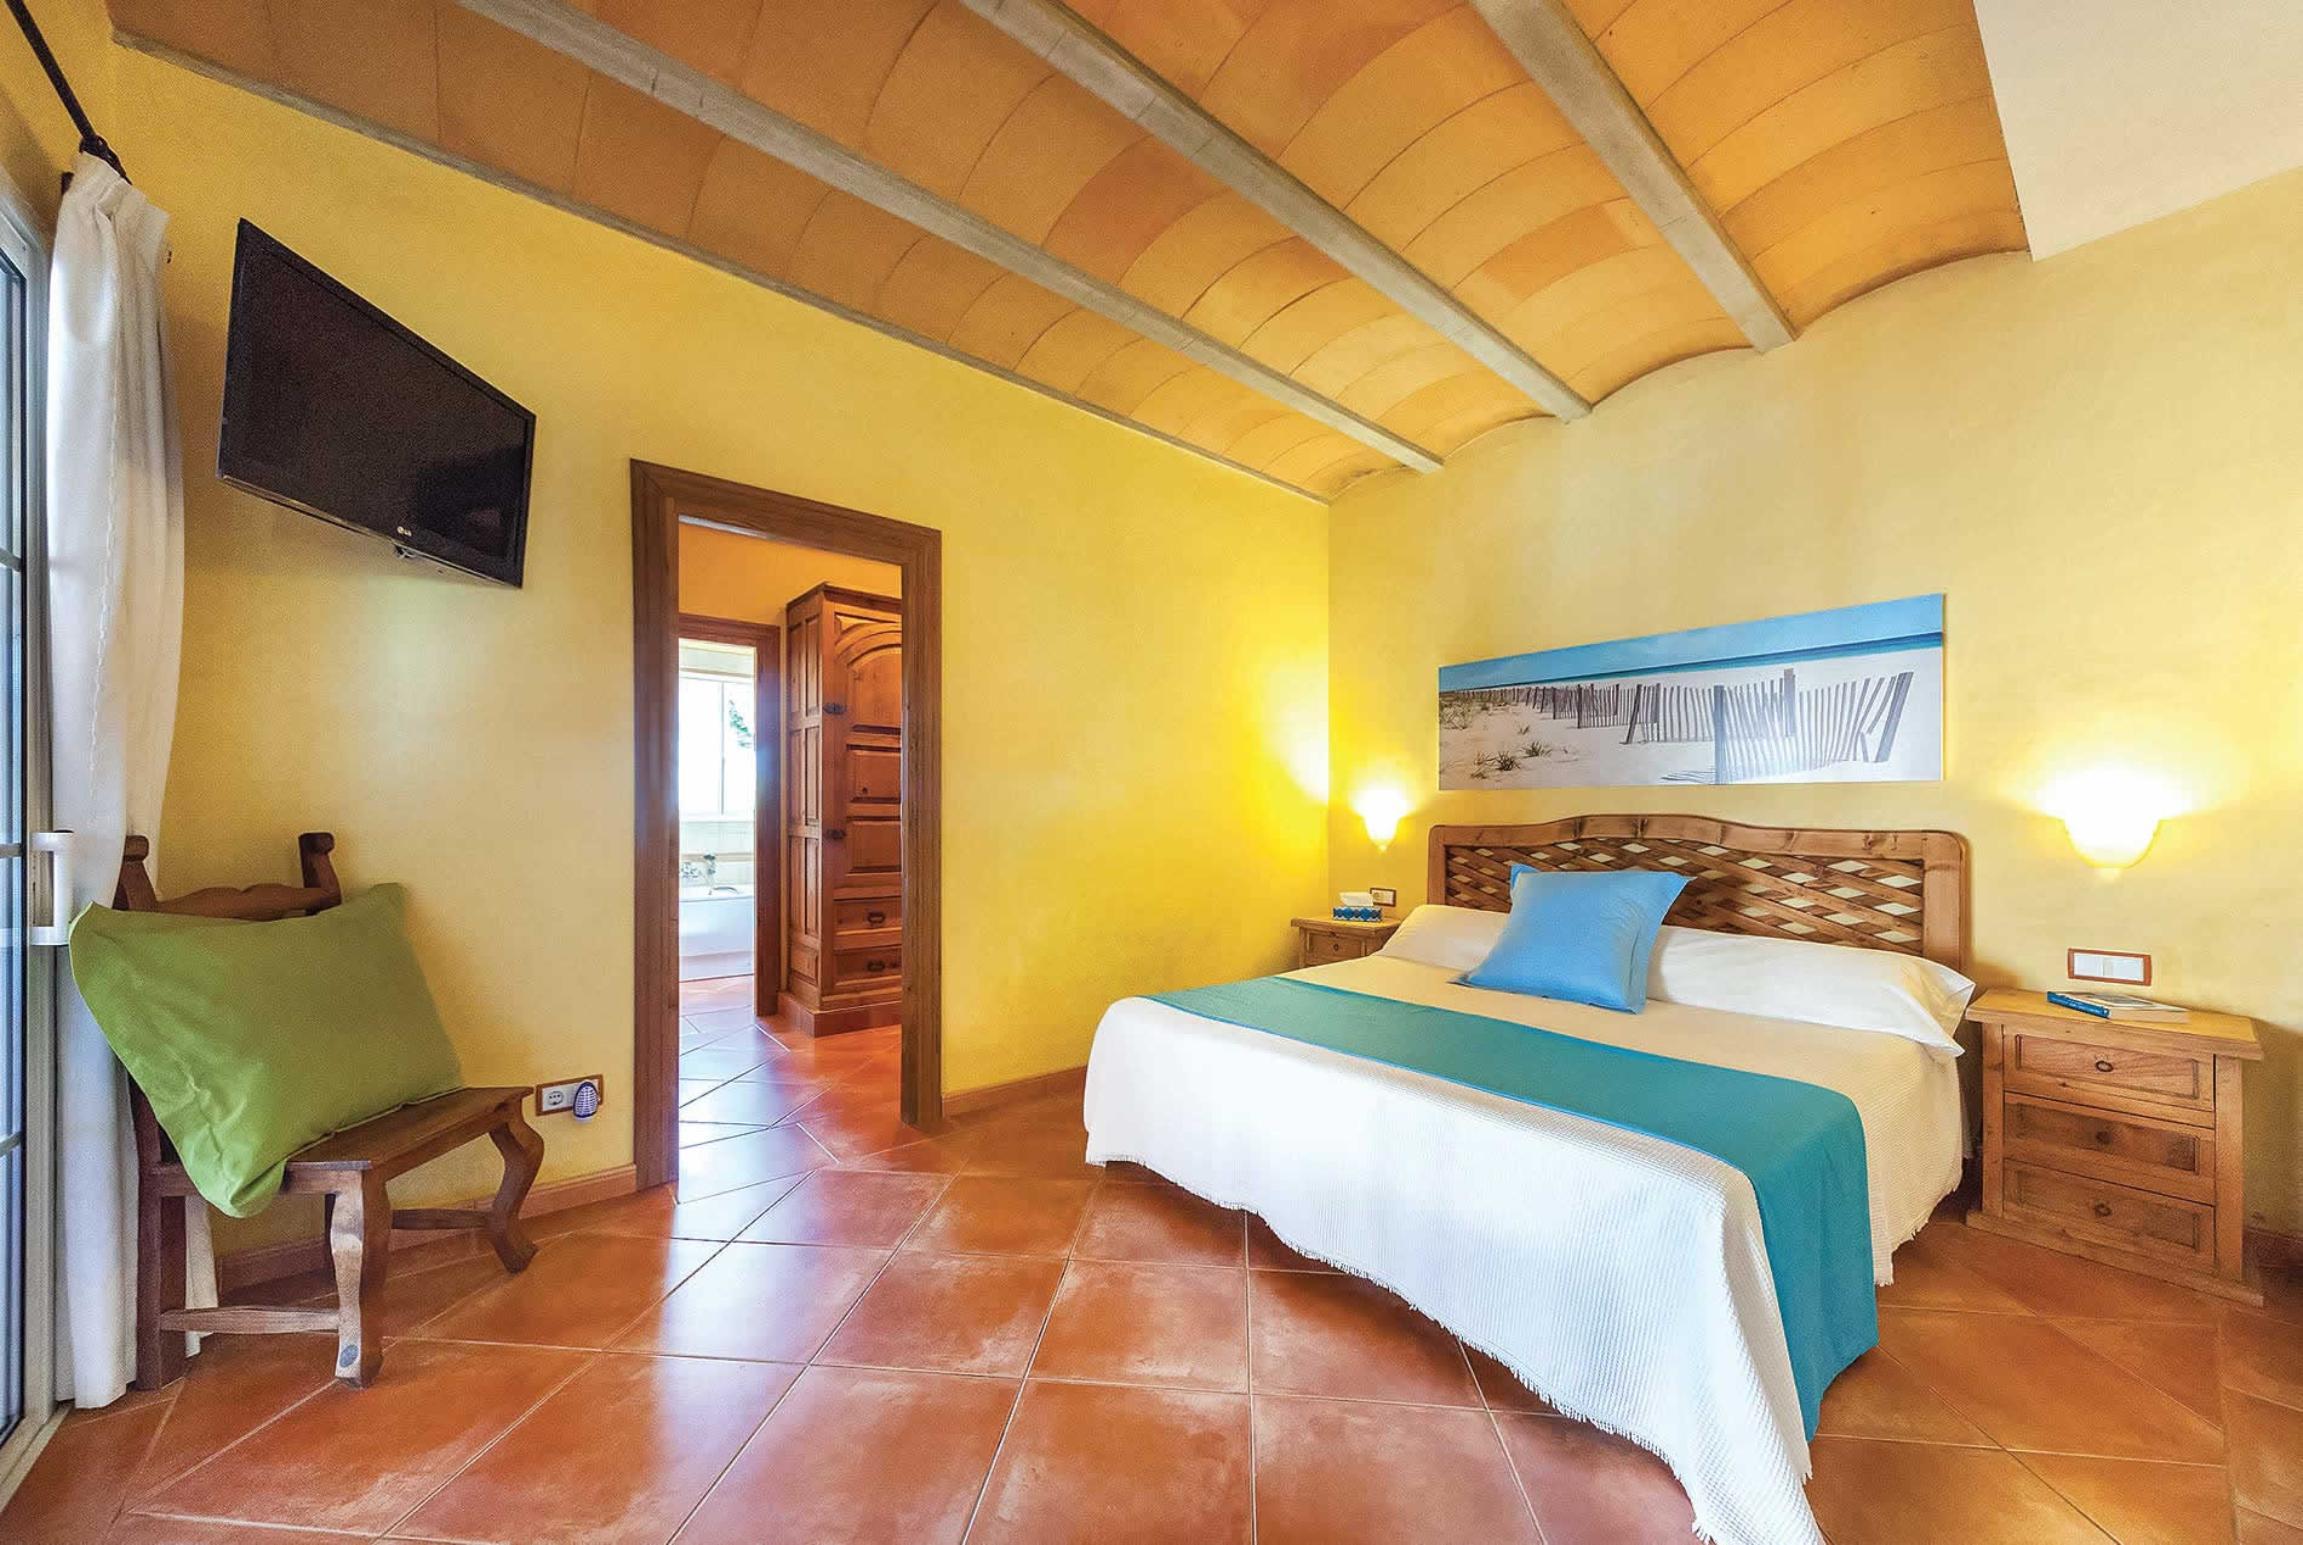 Ferienhaus Villa Estrellita (2649653), Punta Prima, Menorca, Balearische Inseln, Spanien, Bild 5